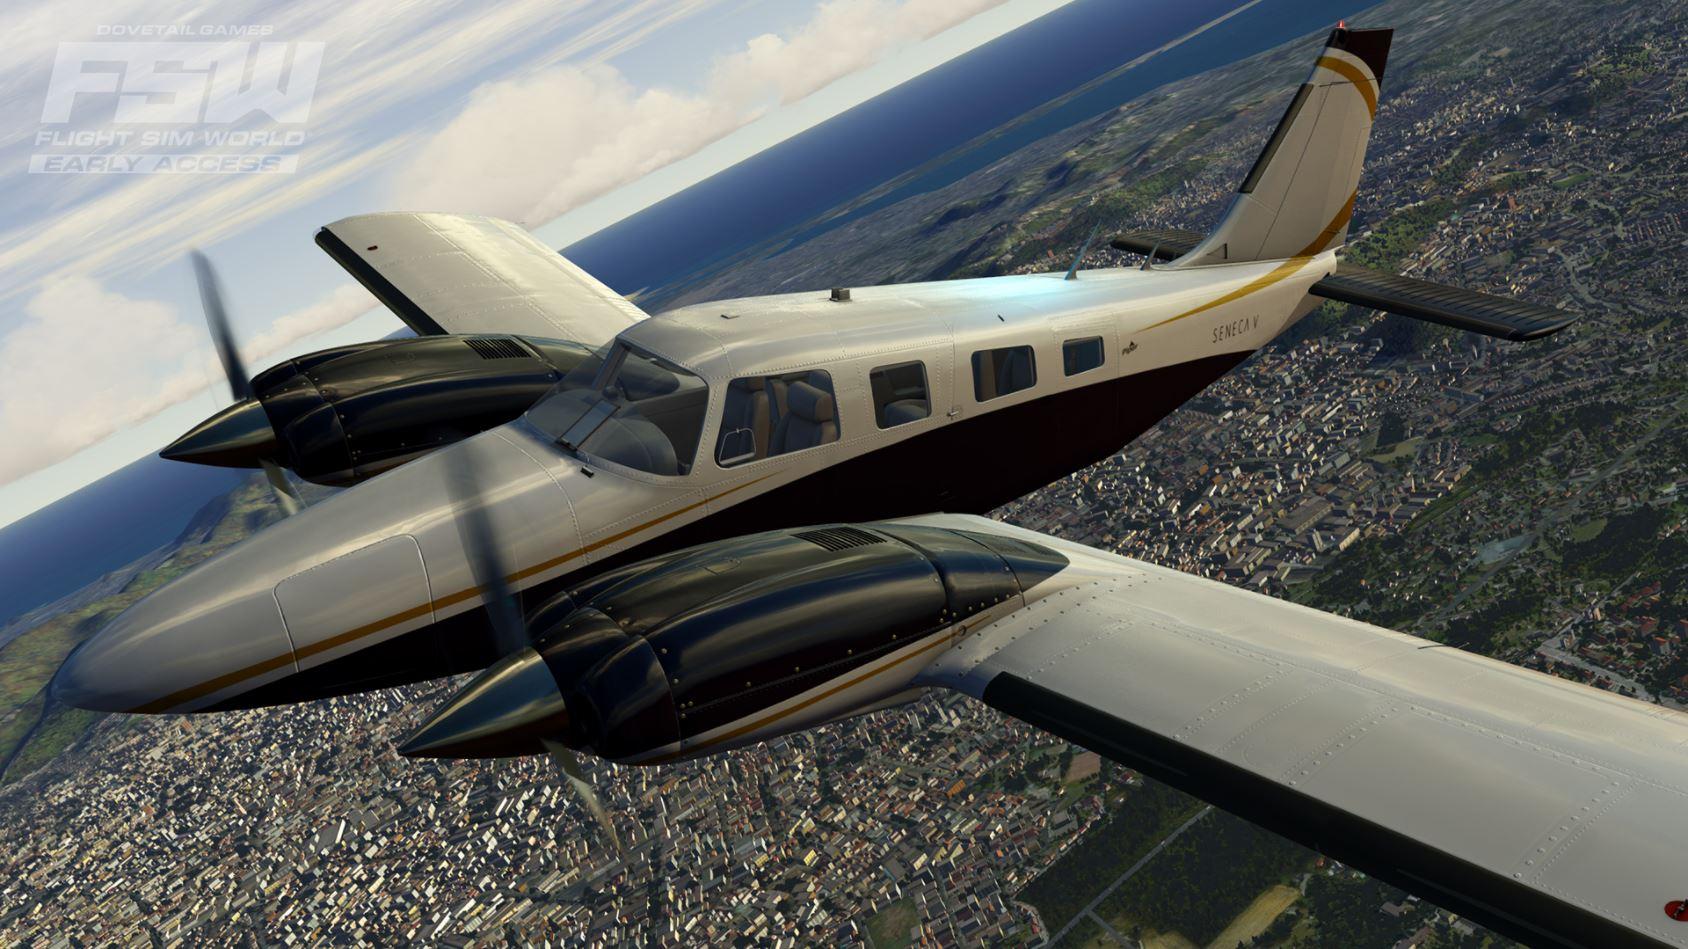 flight-sim-world-en-acces-anticipe-sur-steam-screen14